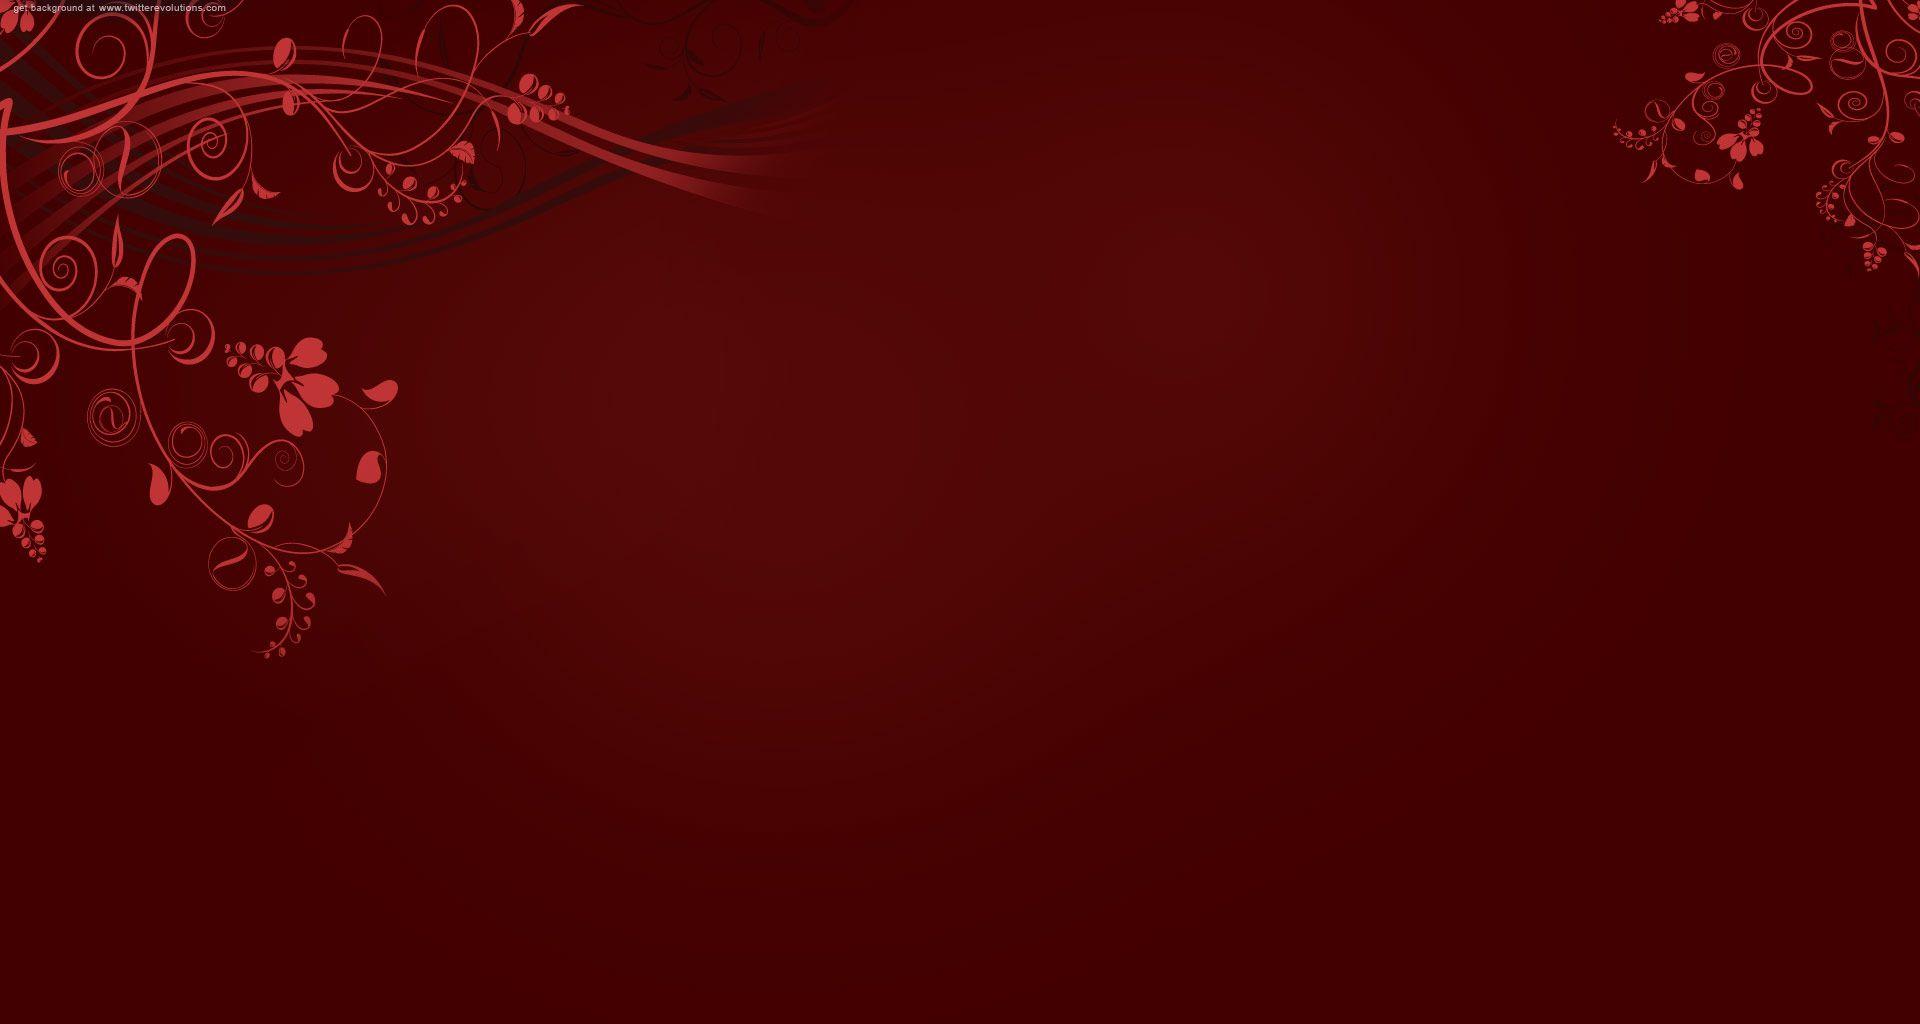 Web Design Backgrounds Red swirls twitter background